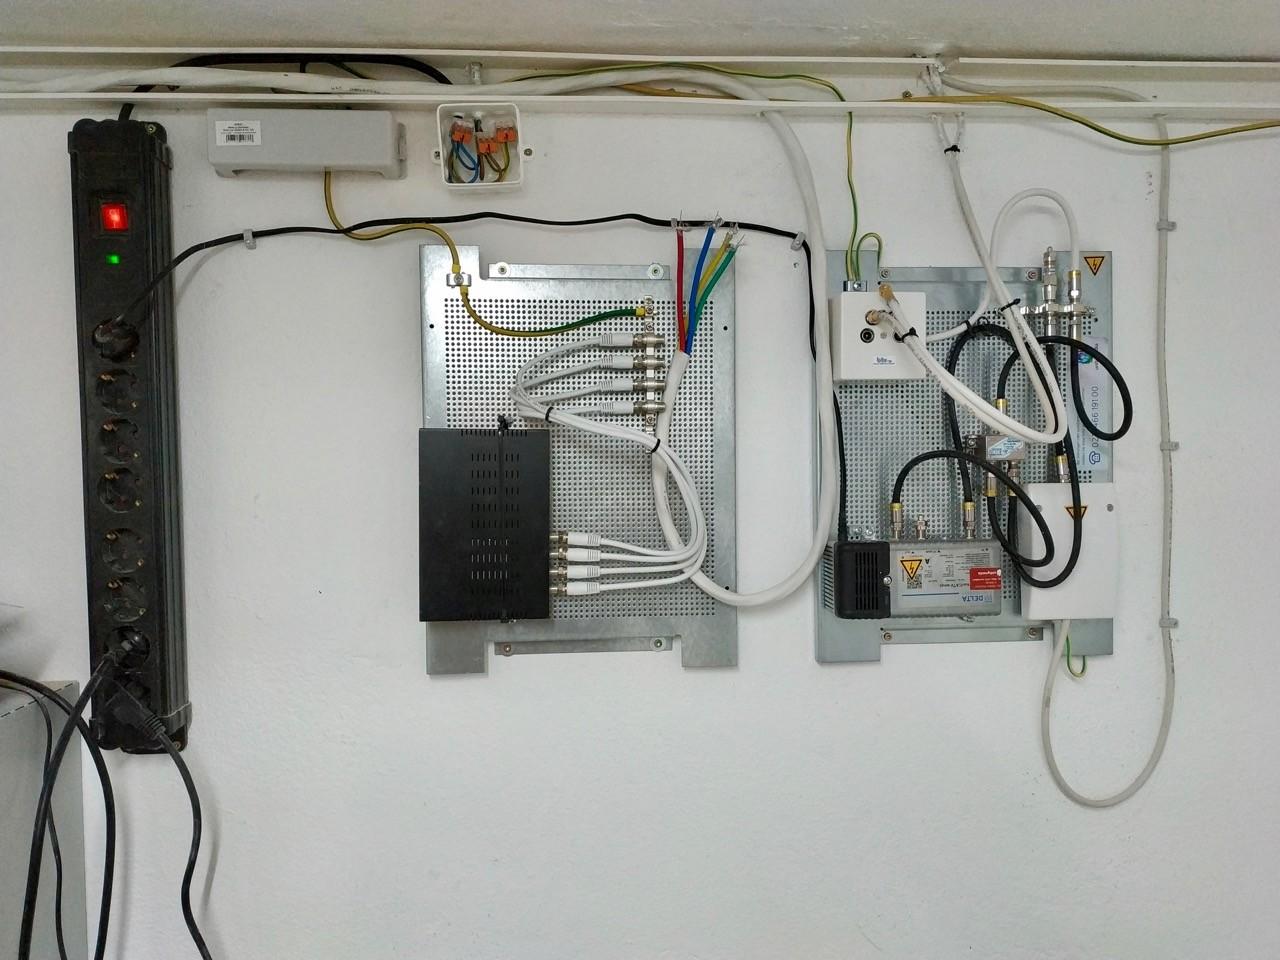 IT-Ecke sat-ip-receiver kabelanschluss